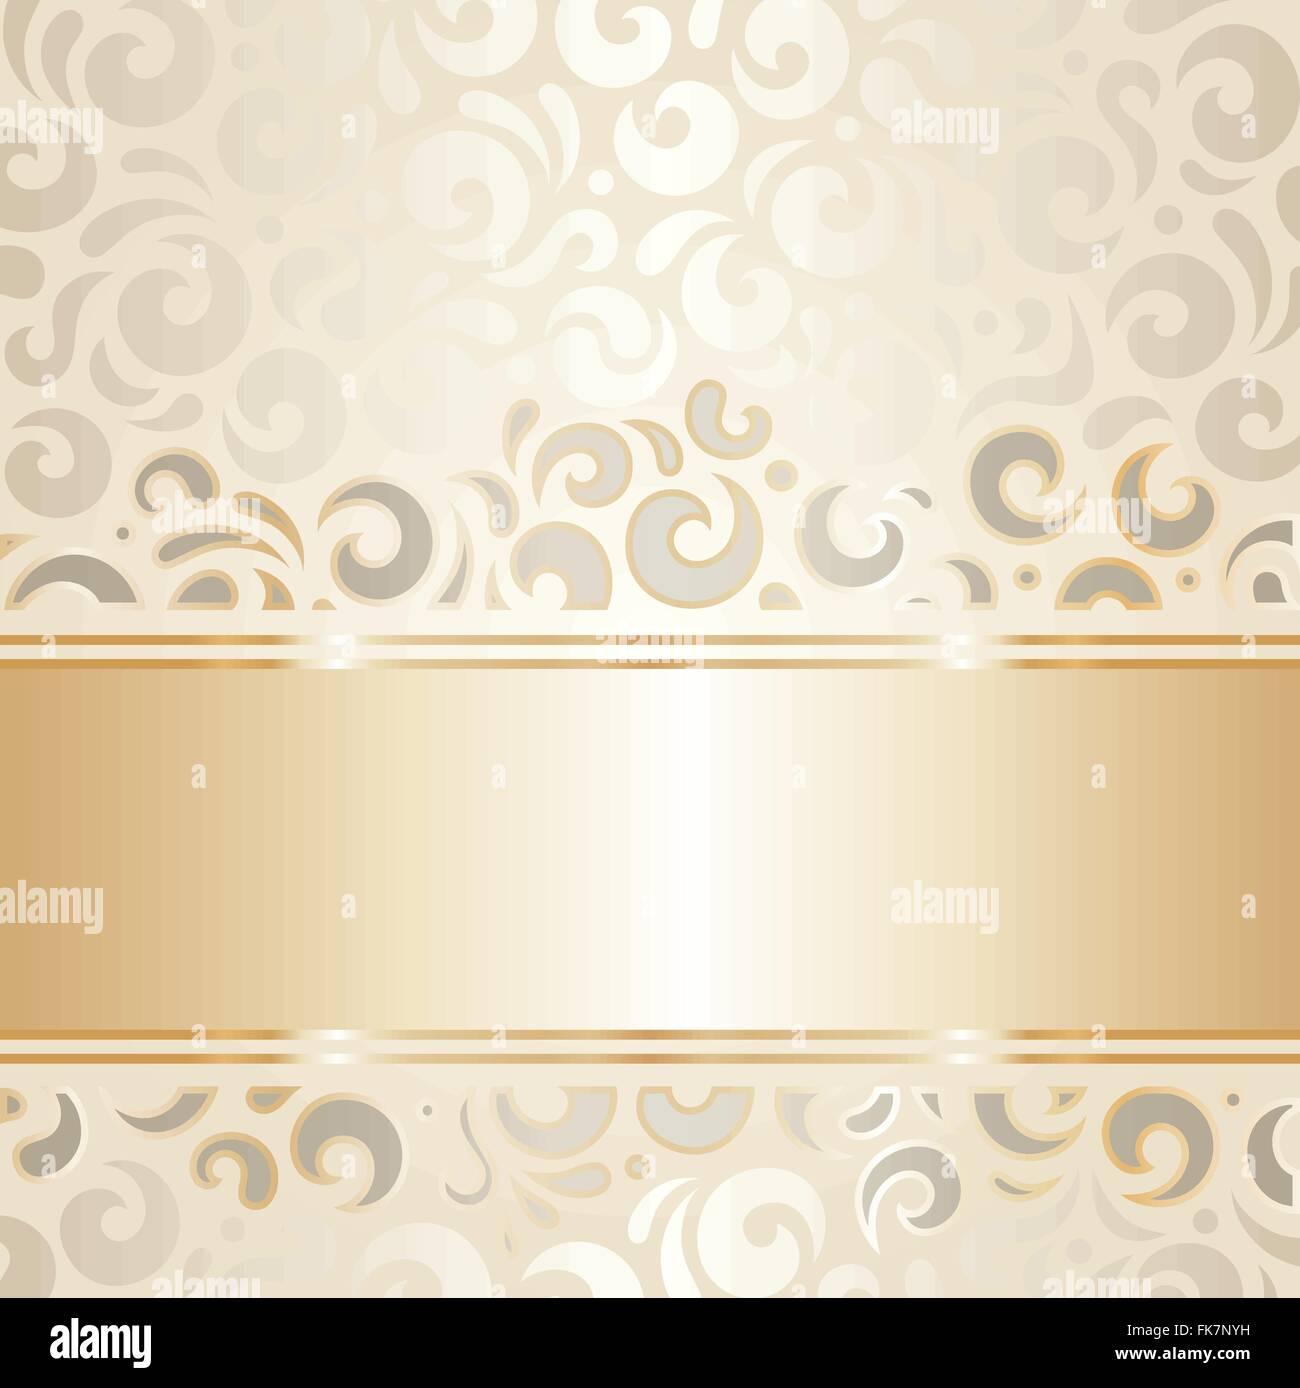 Retro wedding background wallpaper design ecru & gold ...